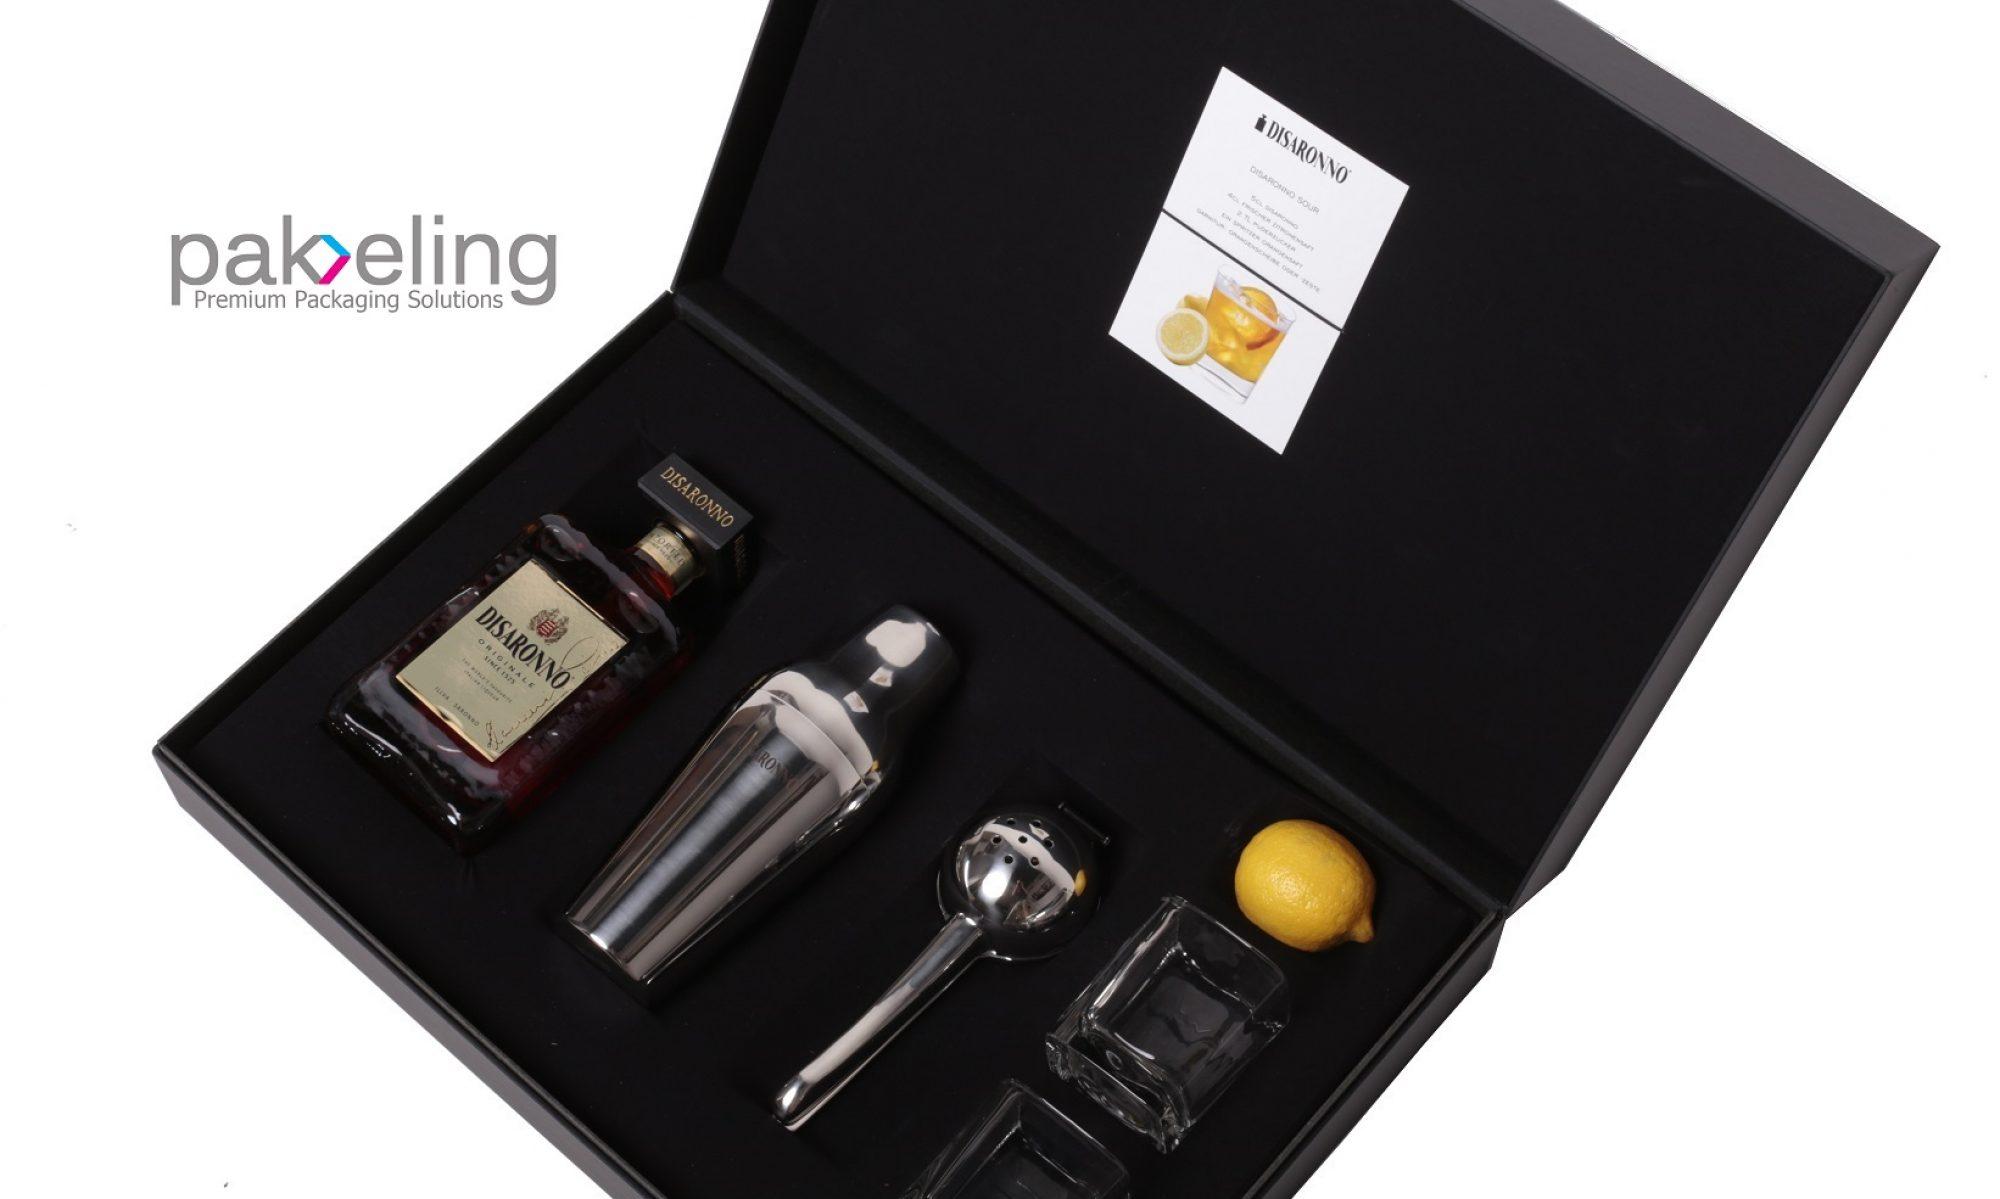 Premiun Packaging Solutions